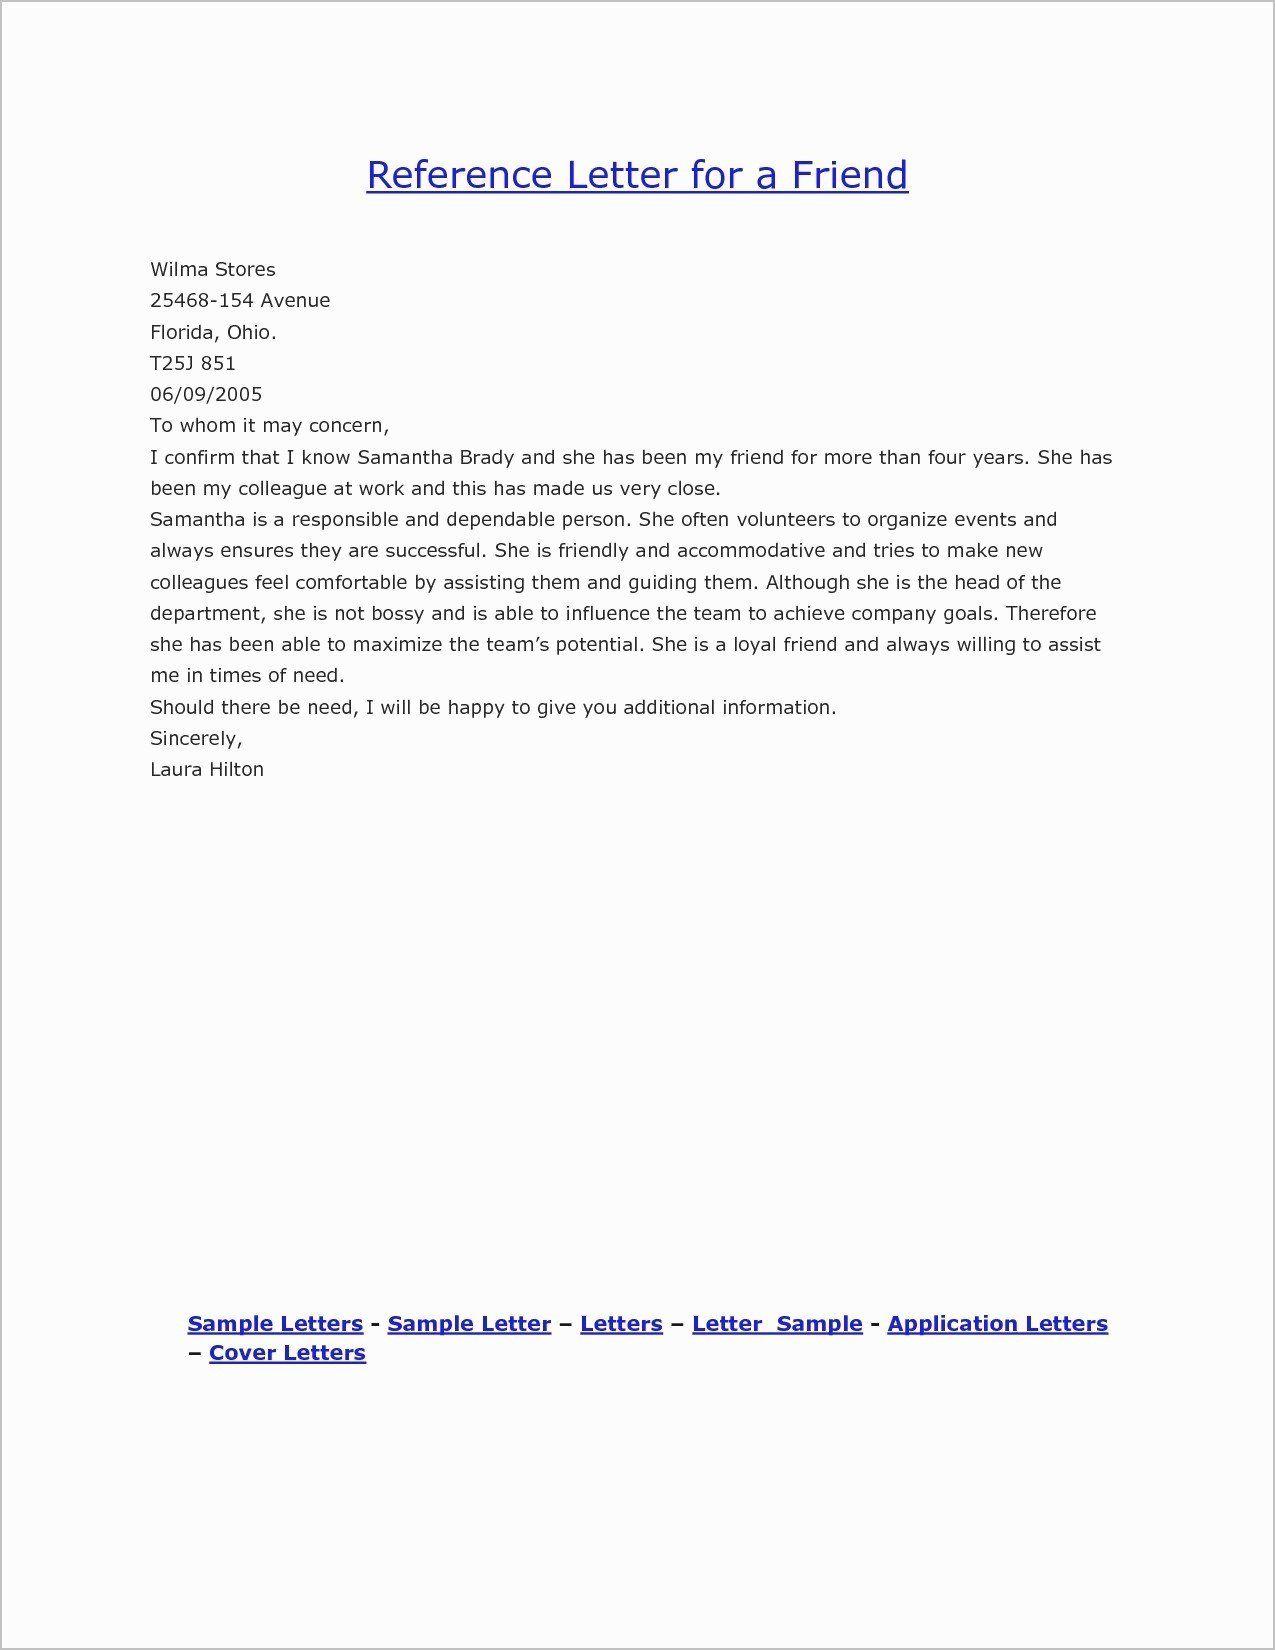 Job Recommendation Letter Sample Template Inspirational New 20 Job Re Mendation Letter Fo Personal Reference Letter Reference Letter Writing A Reference Letter